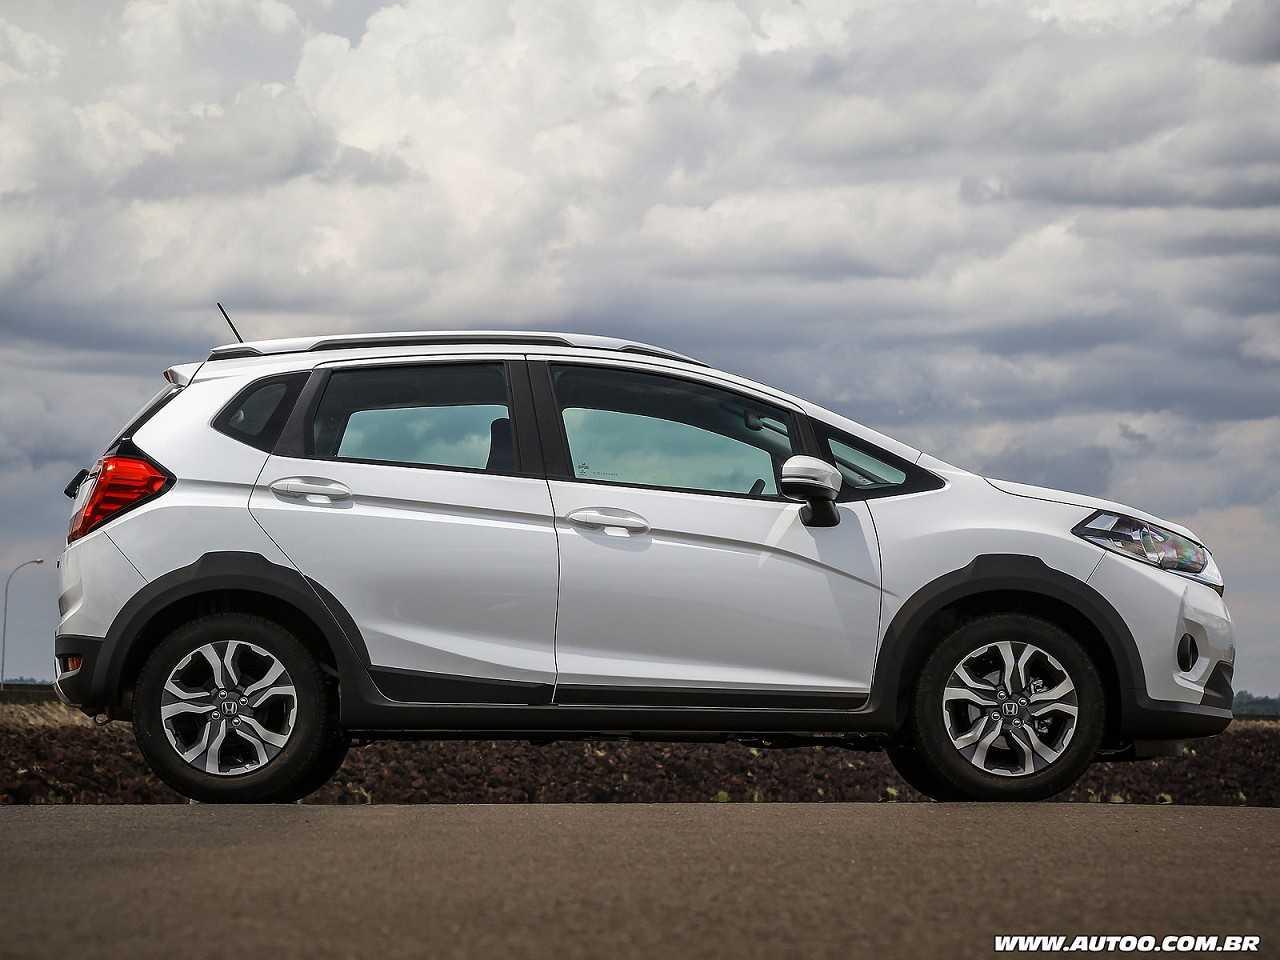 HondaWR-V 2018 - lateral